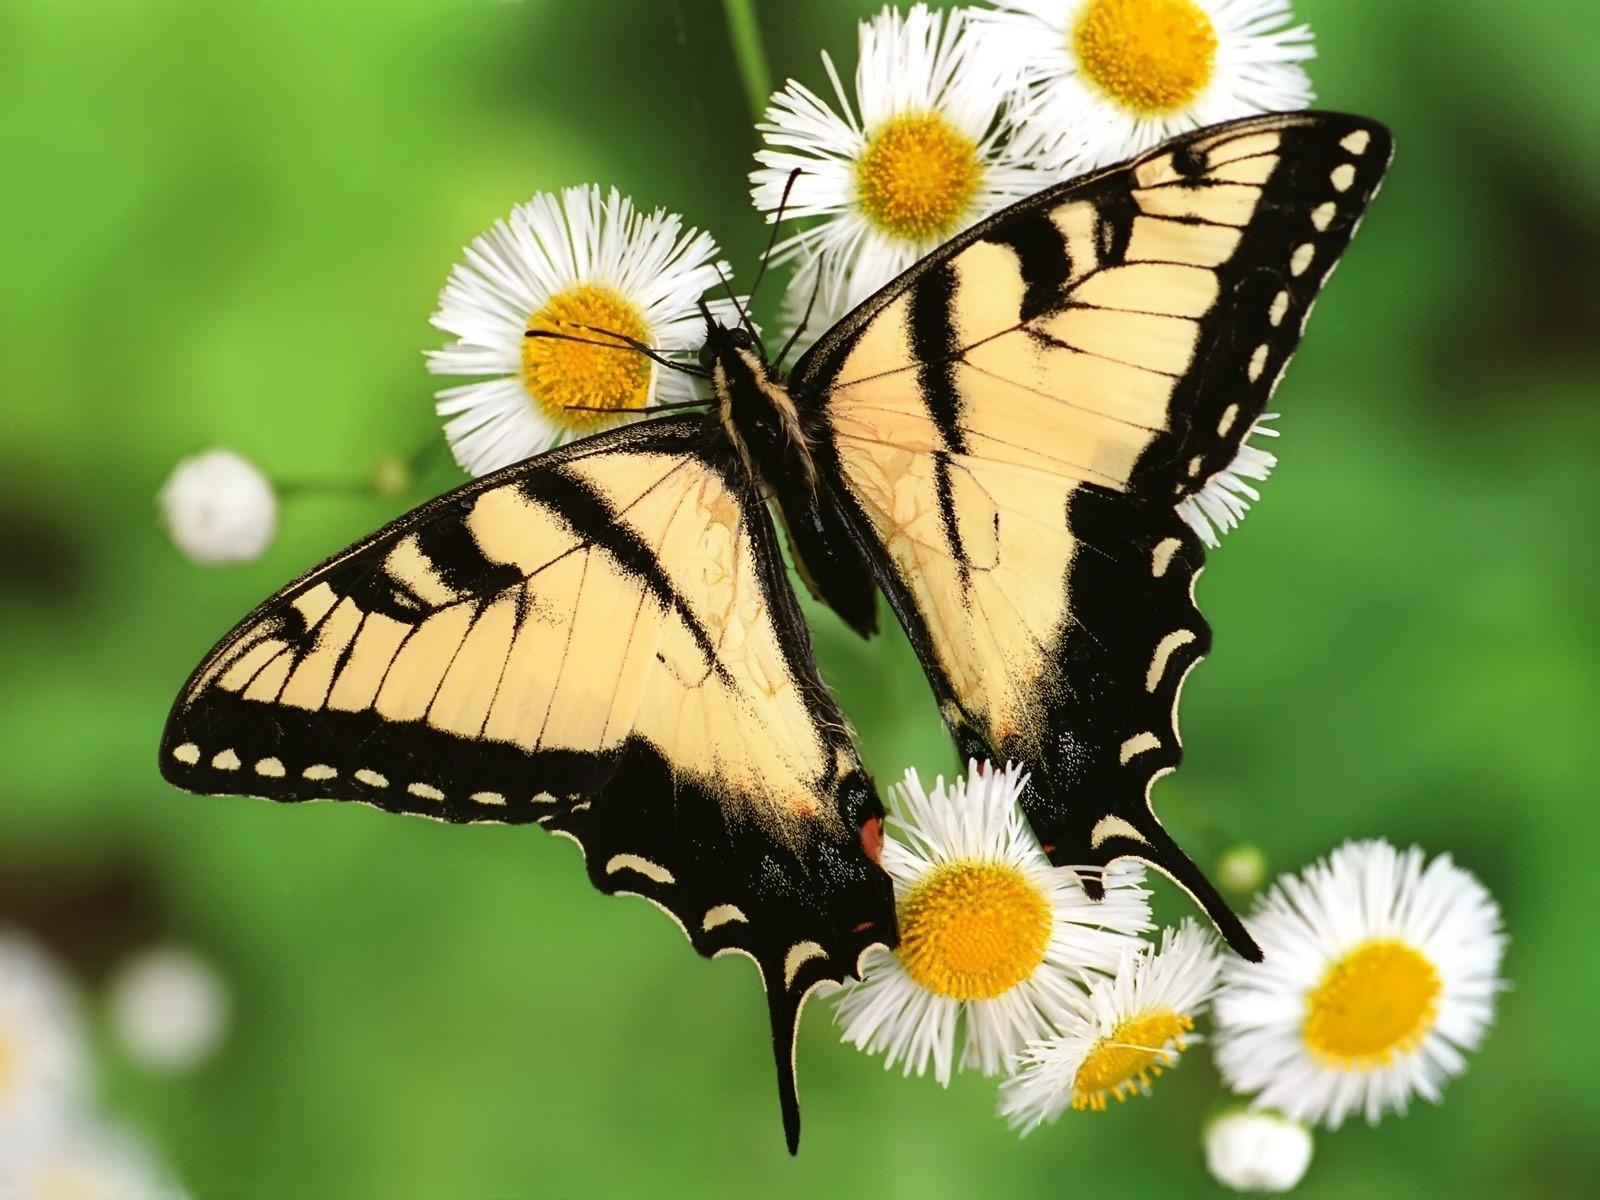 GADGET: HD Butterfly Wallpapers For Desktop